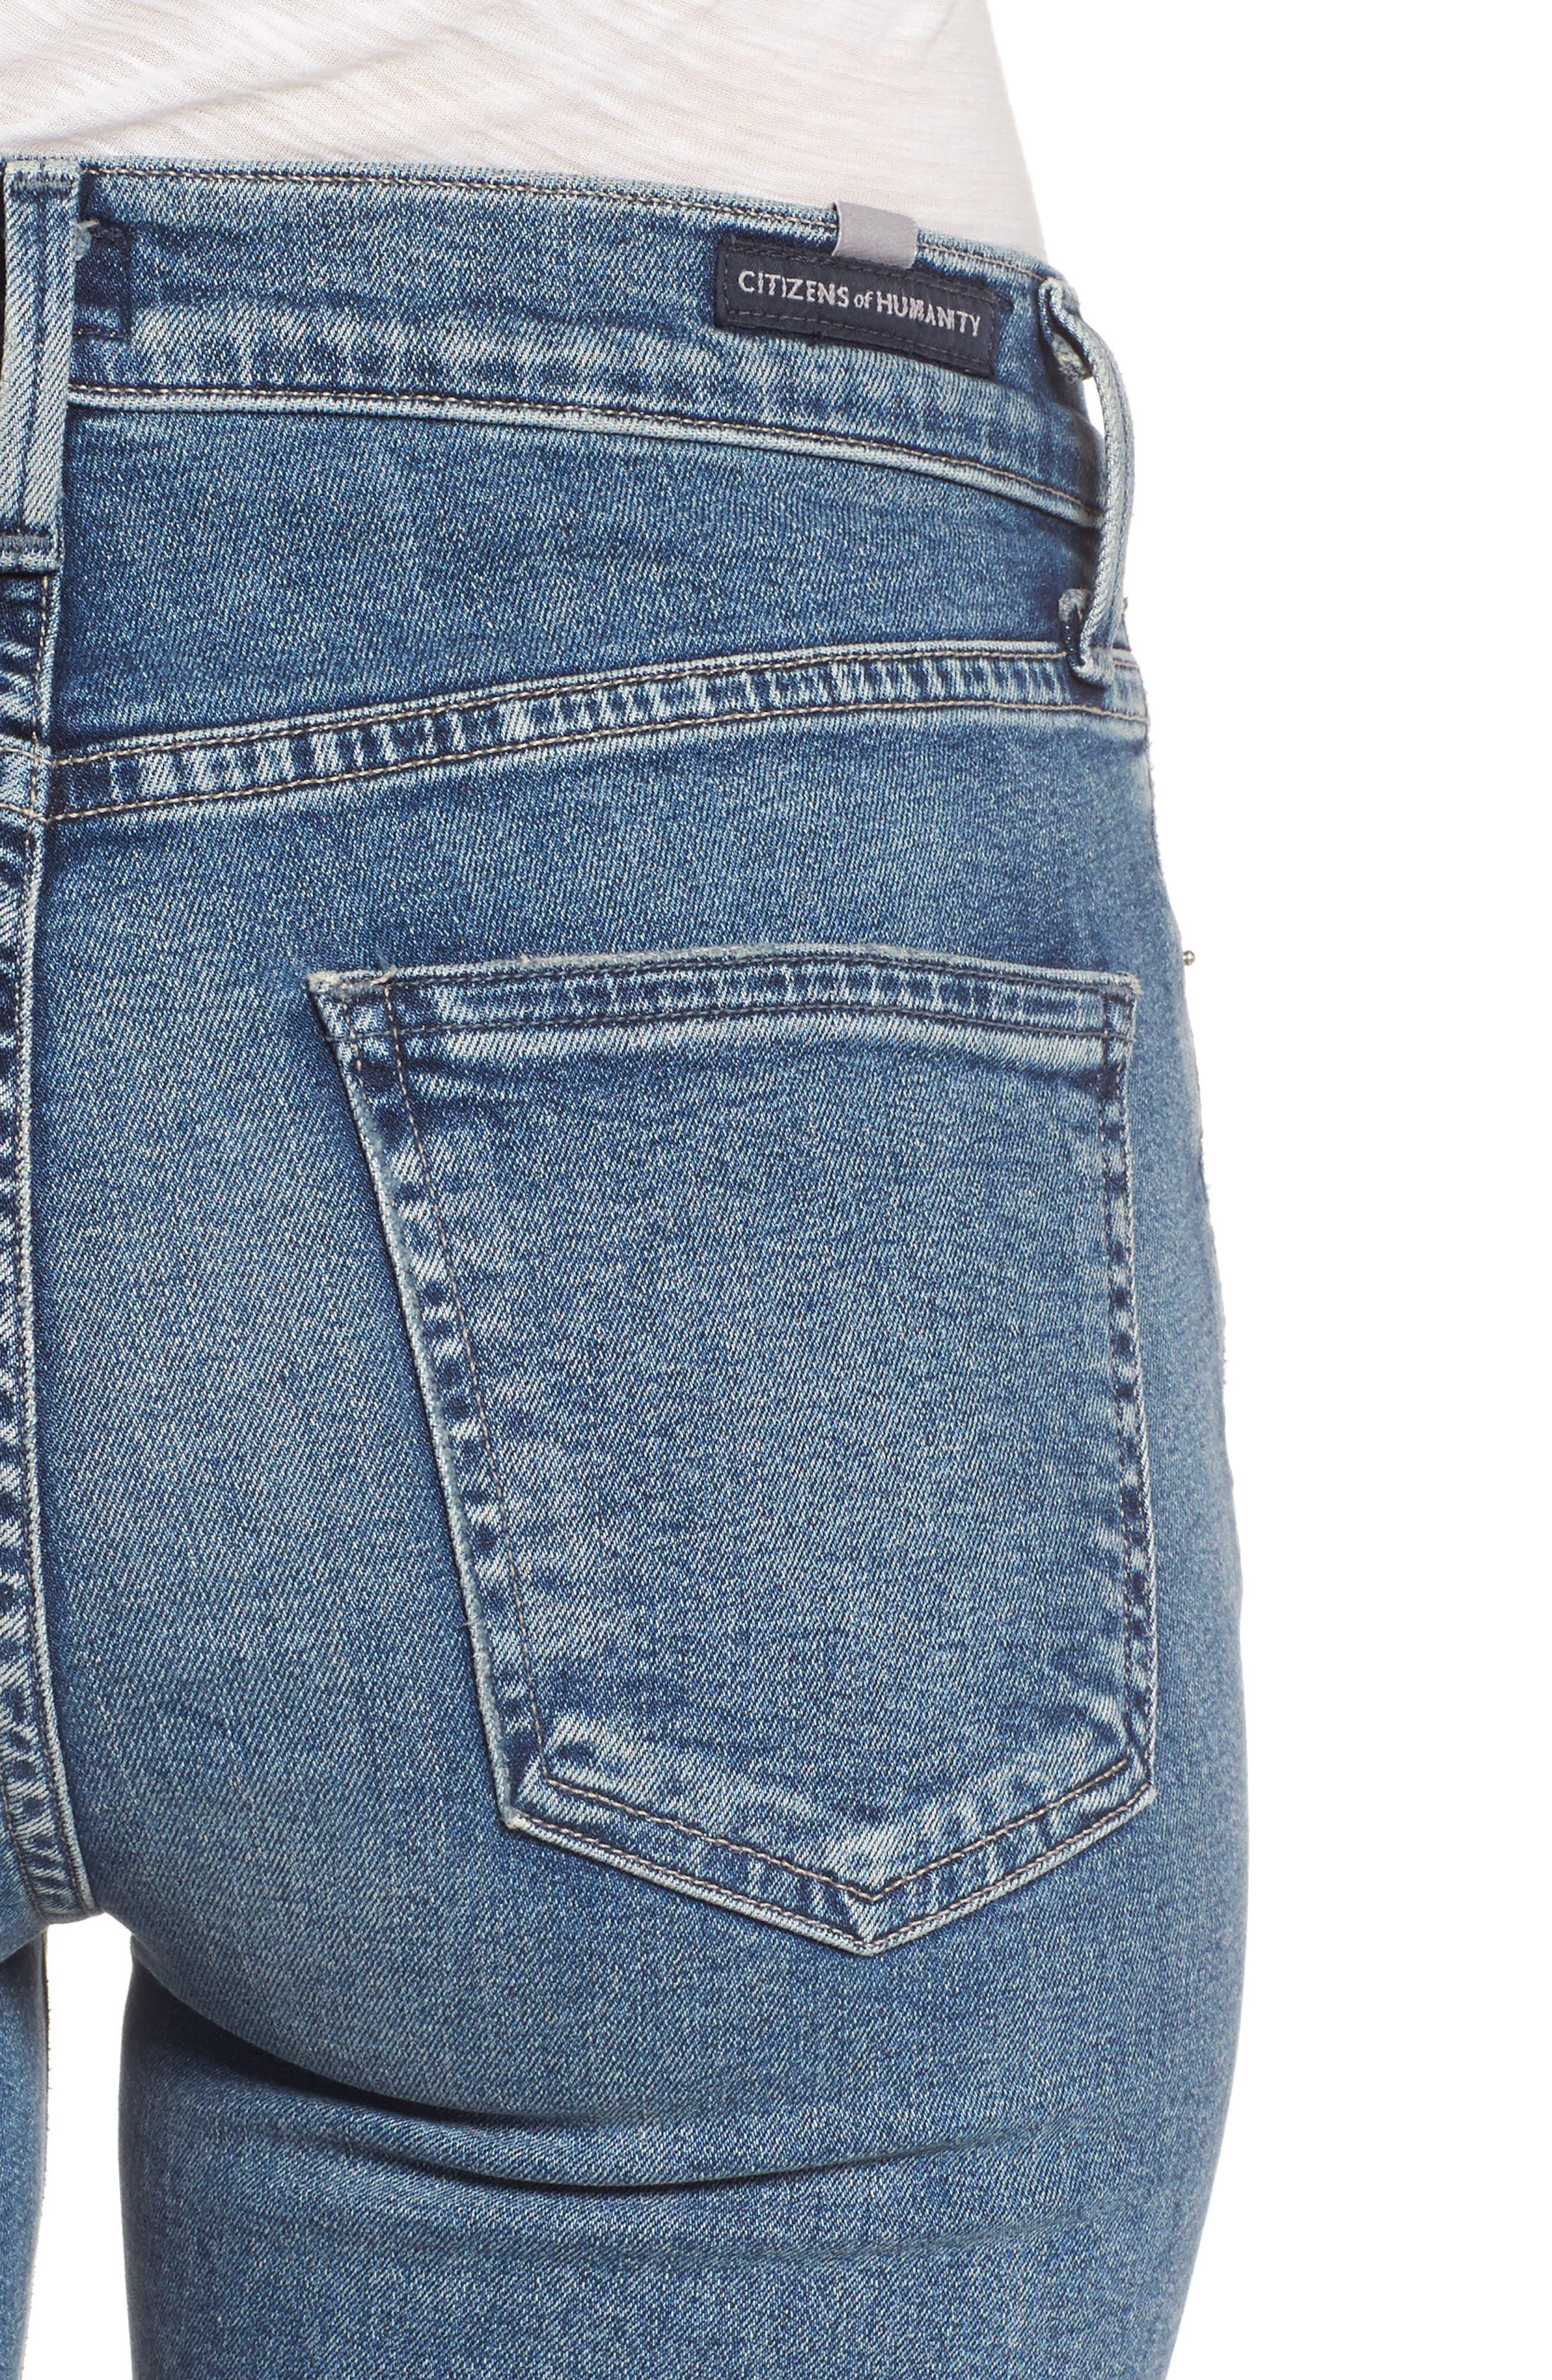 Alternate Image 4  - Citizens of Humanity Rocket Crop Skinny Jeans (Orbit)